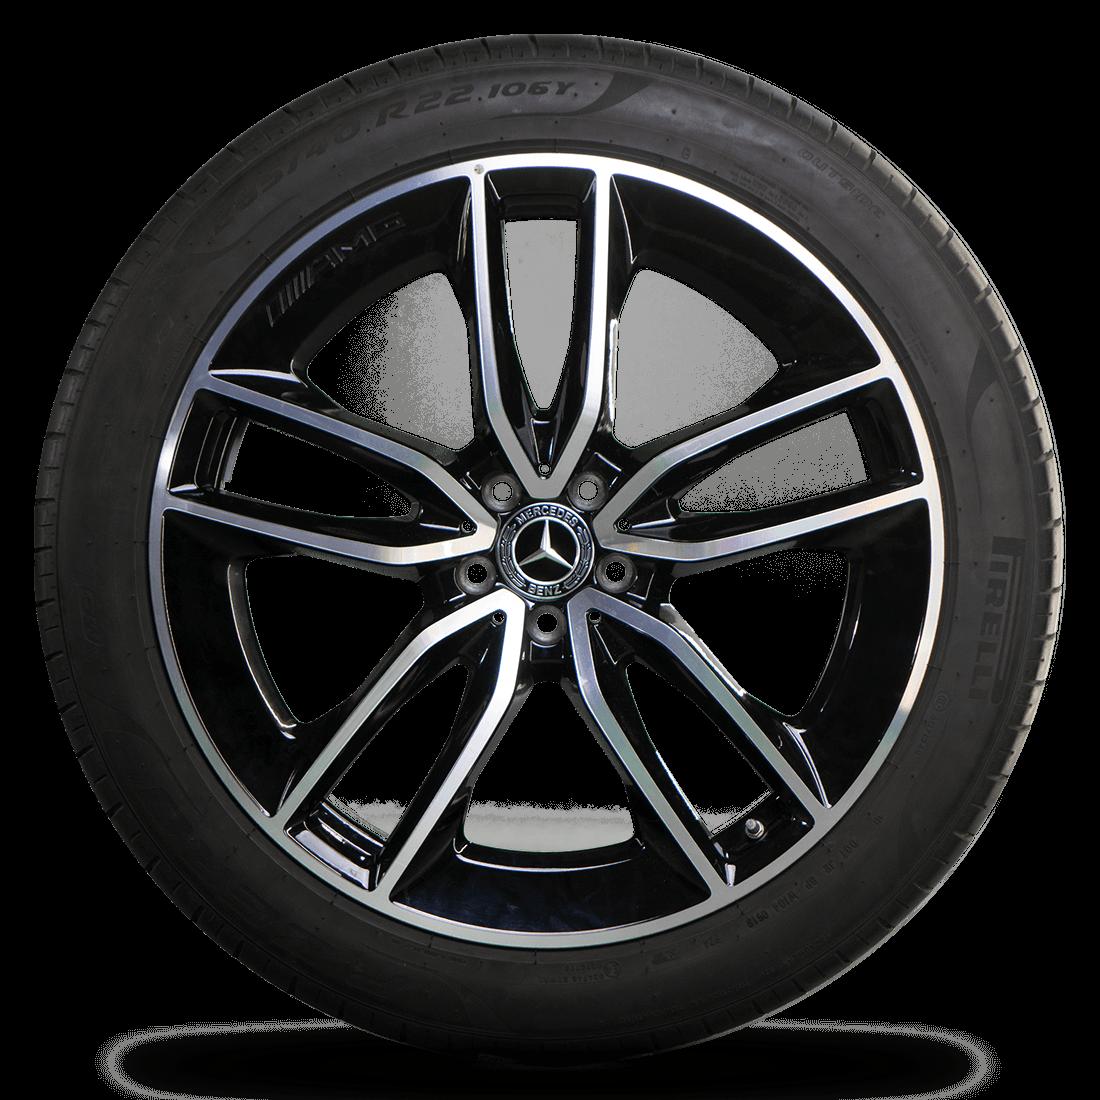 22 Inch Tires >> Amg 22 Inch Rims Gle W167 V167 Alloy Rims Summer Summer Tires